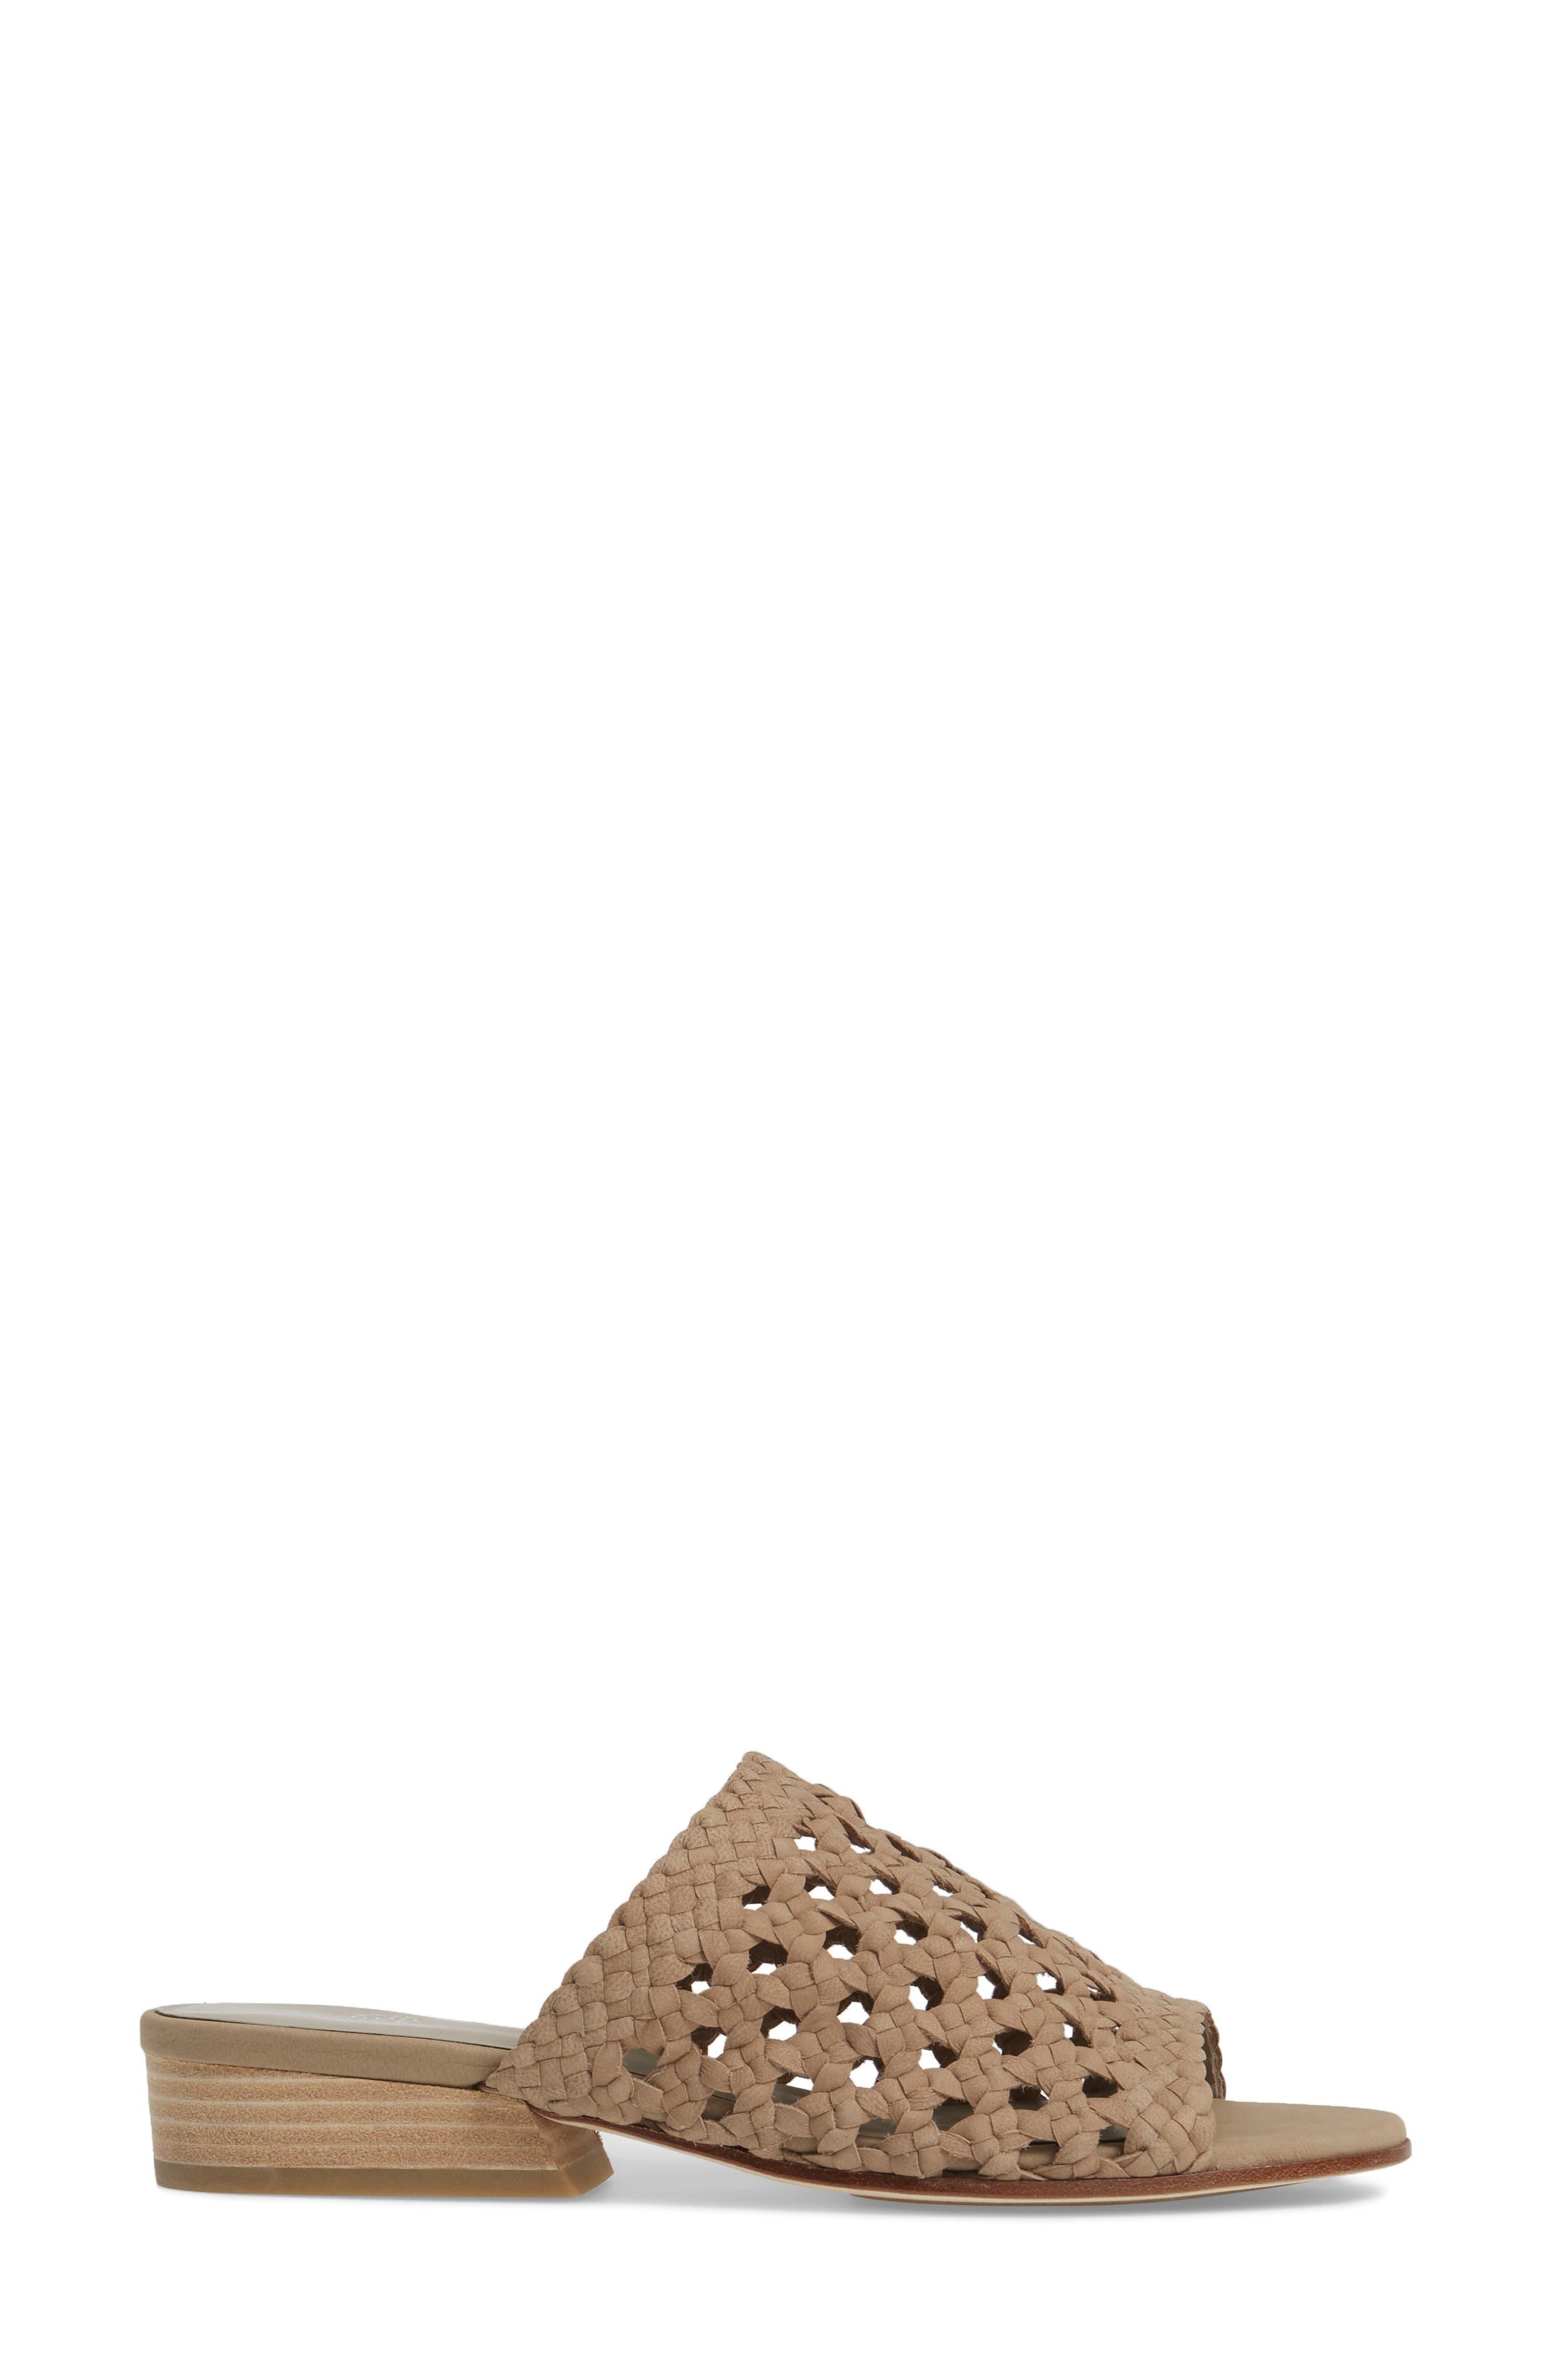 Aloe Slide Sandal,                             Alternate thumbnail 3, color,                             Earth Leather